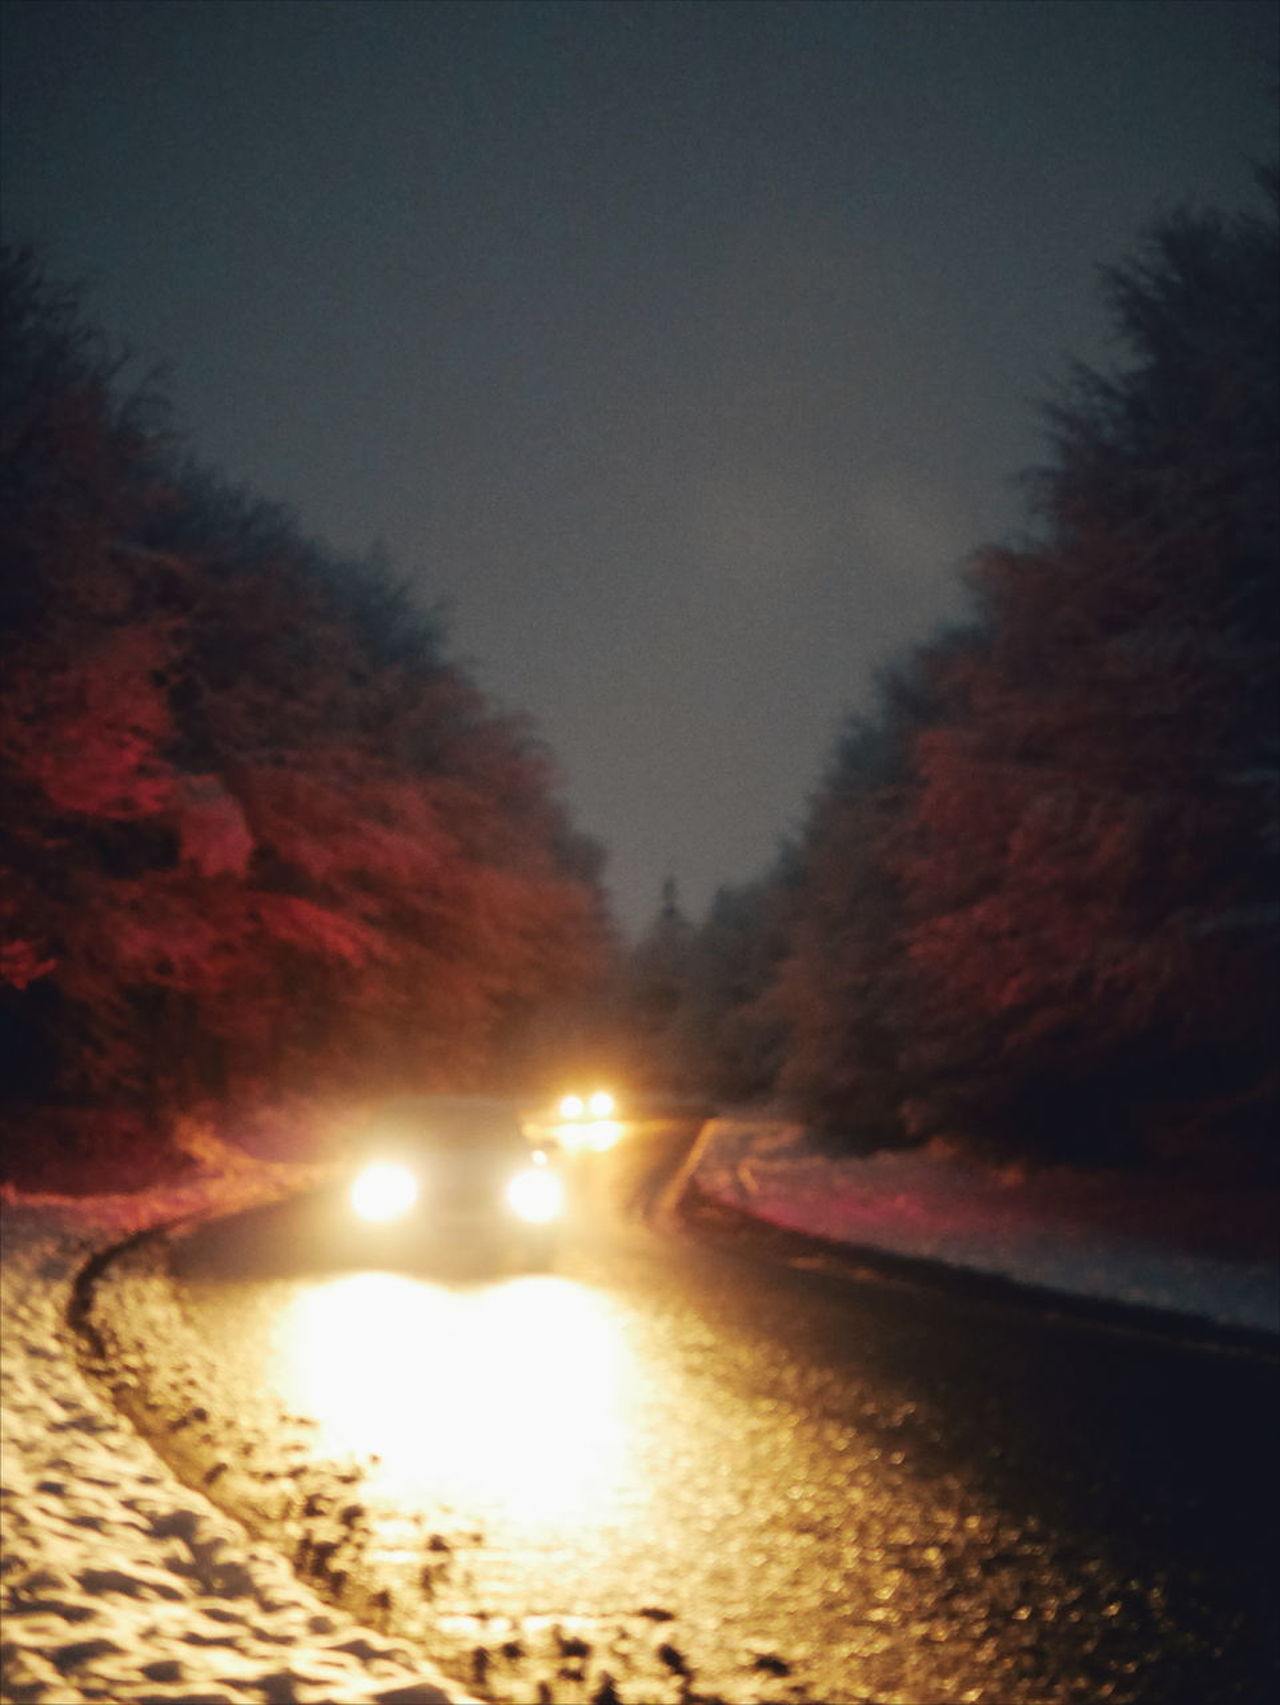 night snow Road car Cars illuminated Winter cold temperature snow Tree no people